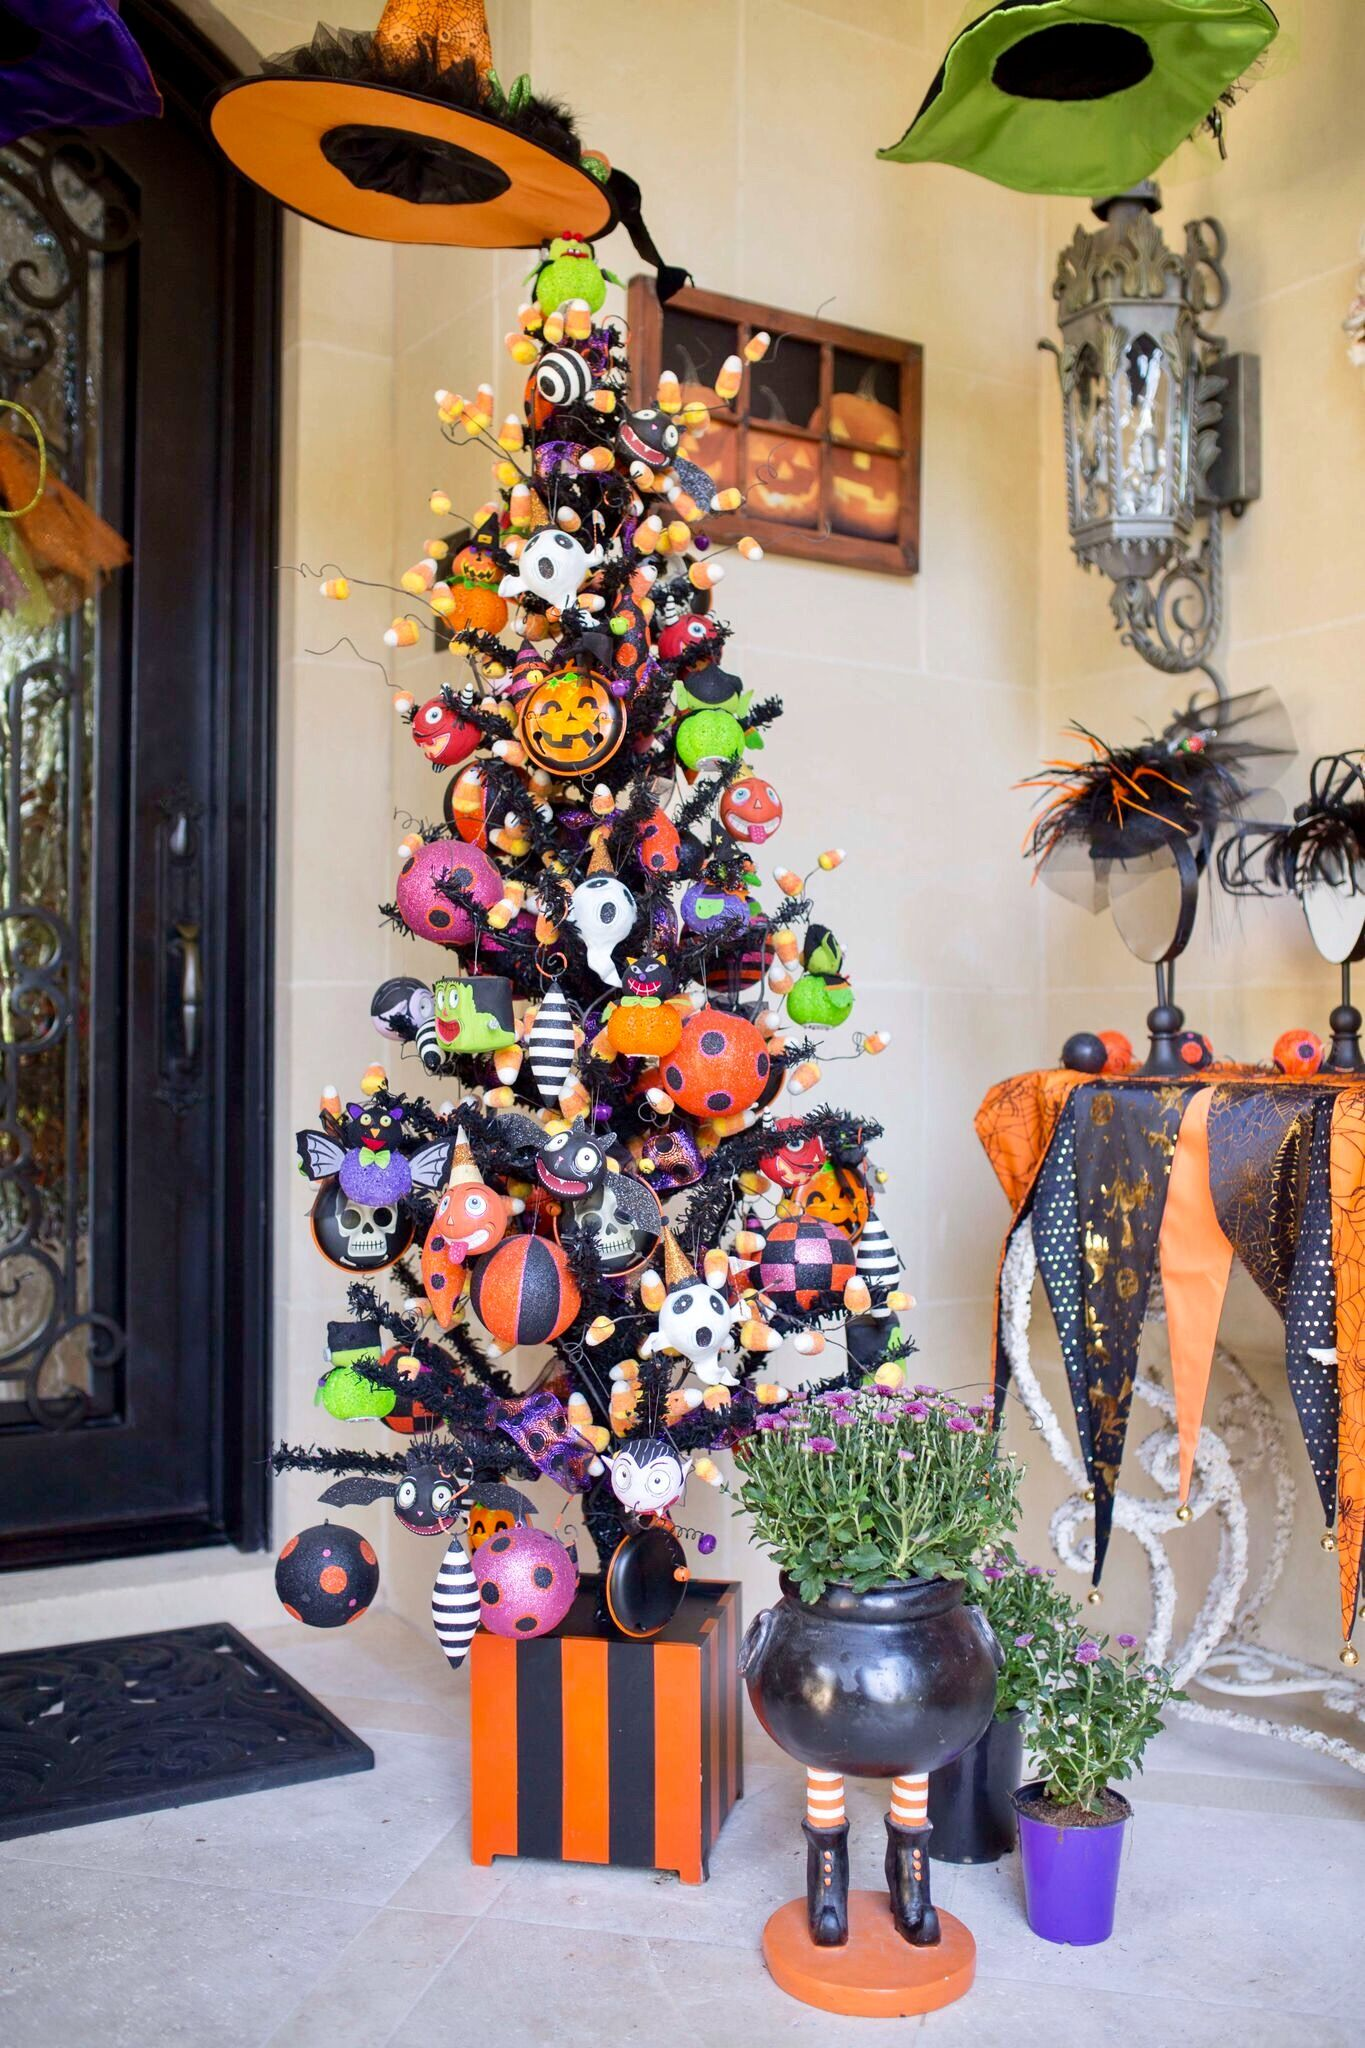 Pin By Sweet Magnolia On Halloween Halloween Tree Decorations Diy Halloween Decorations Spooky Halloween Decorations